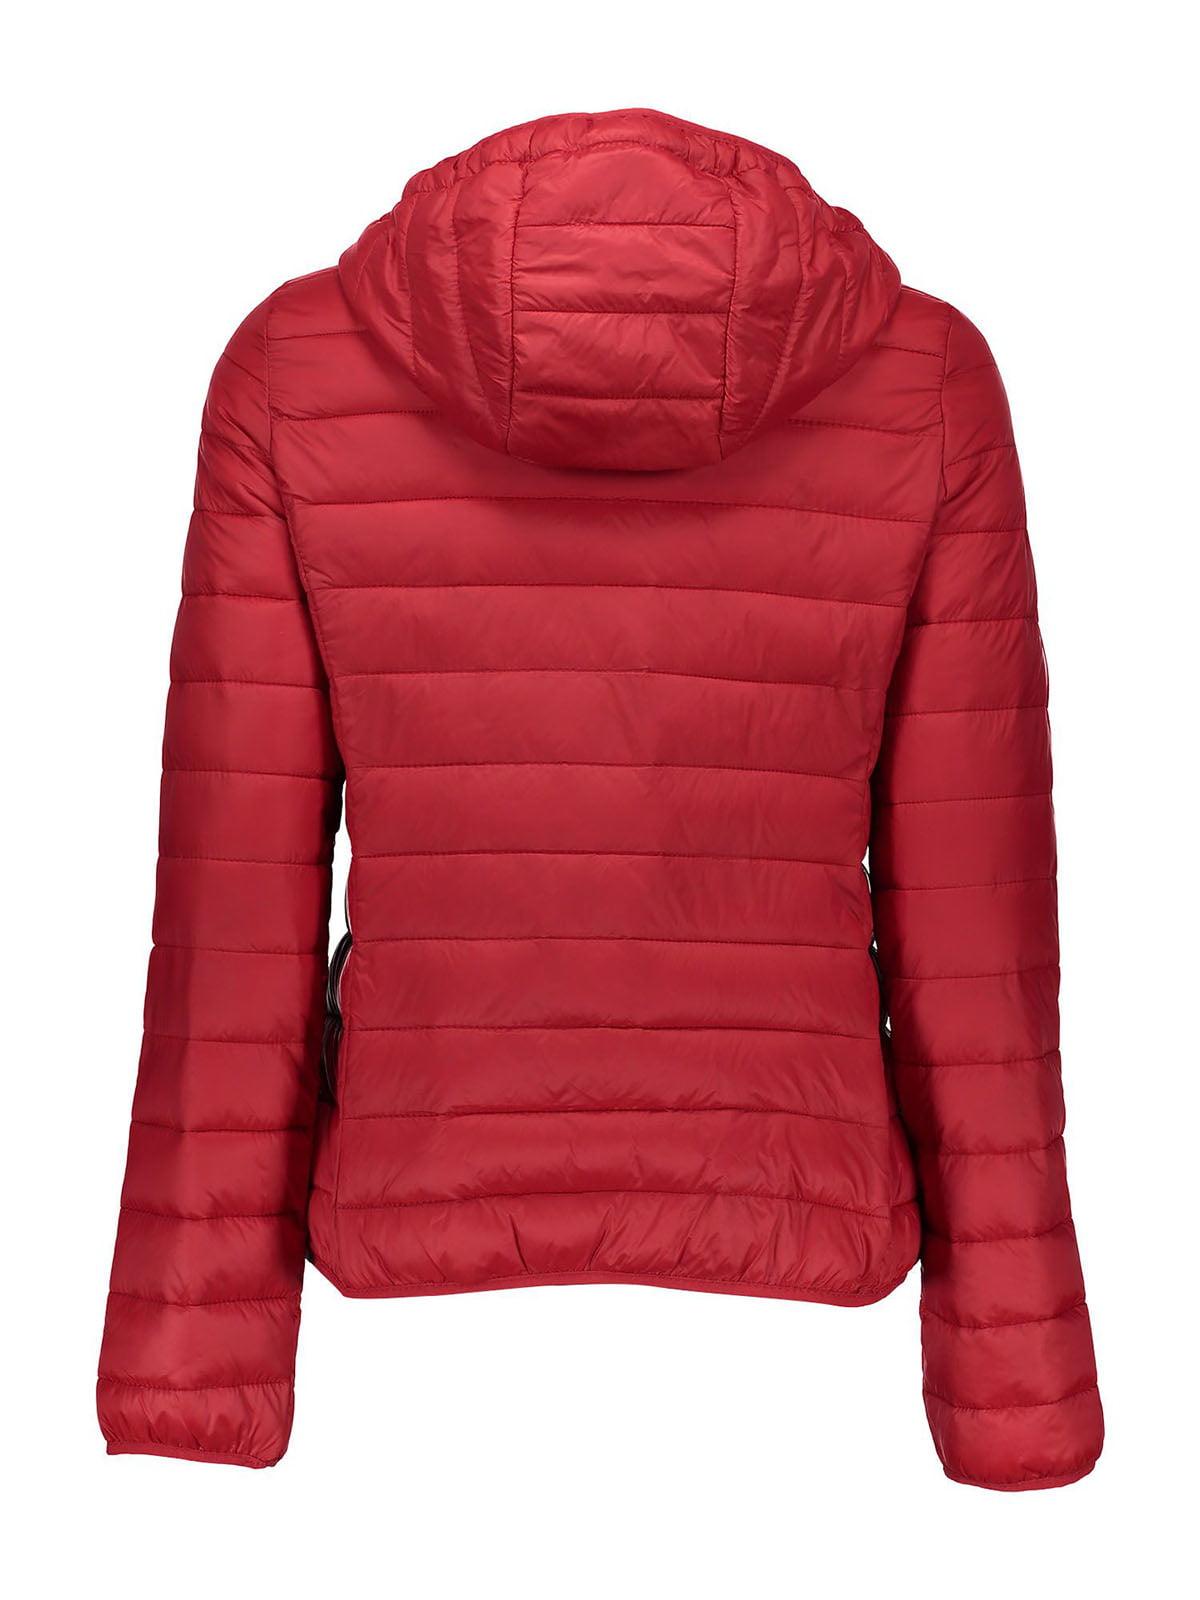 Куртка красная | 4874480 | фото 2